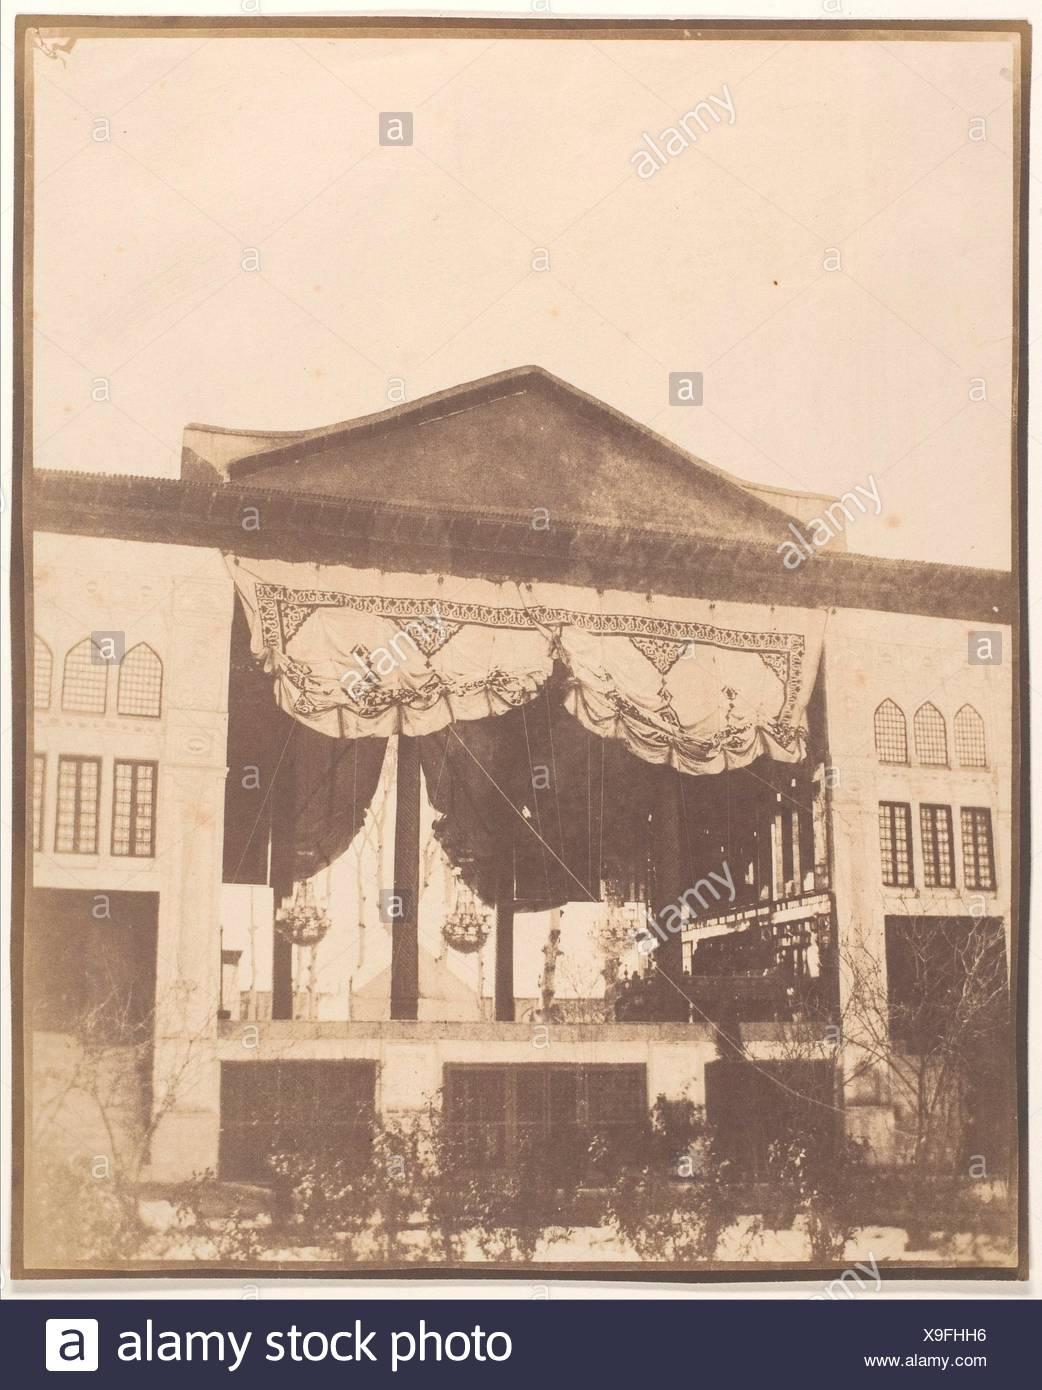 [Peacock's Throne Room, Teheran]. Artist: Luigi Pesce (Italian, 1818-1891); Date: 1858; Medium: Salted paper print from paper negative; - Stock Image